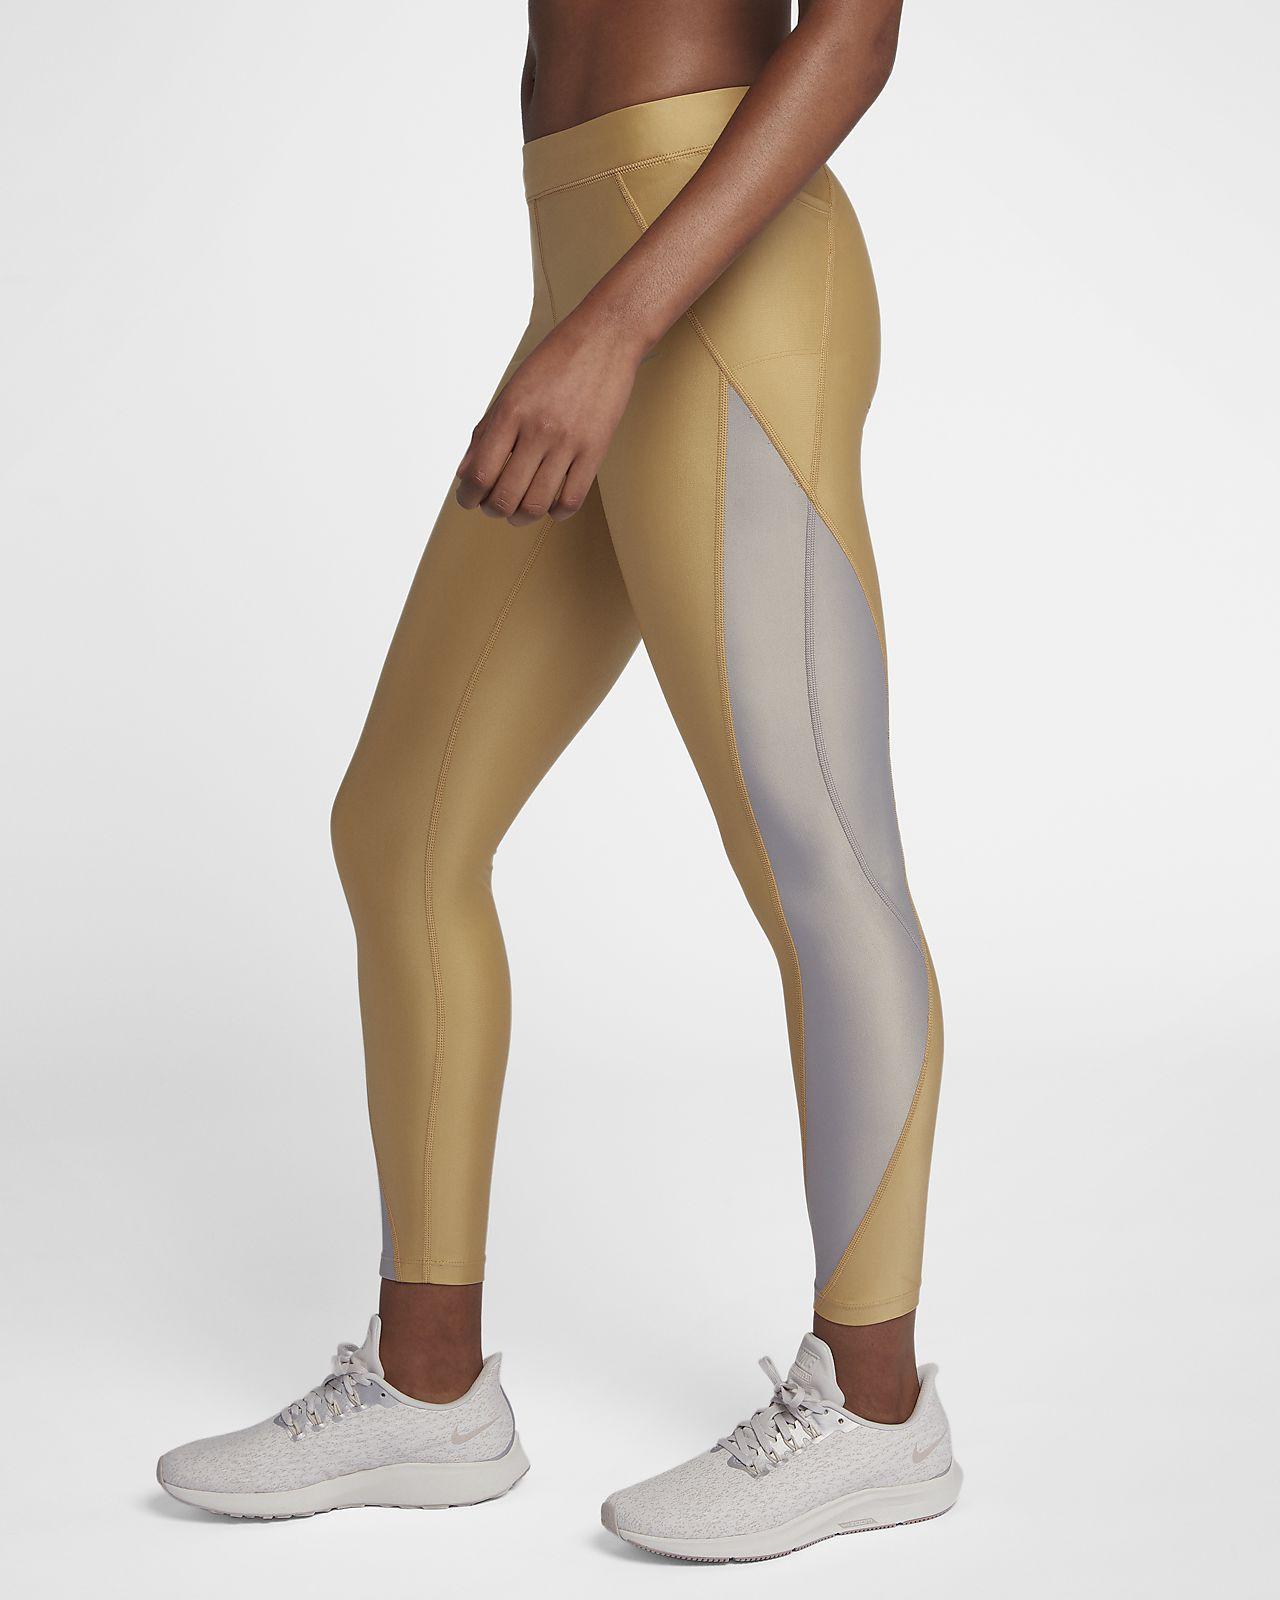 37efd871204be Nike Speed Women's 7/8 Mid-Rise Metallic Running Tights. Nike.com LU